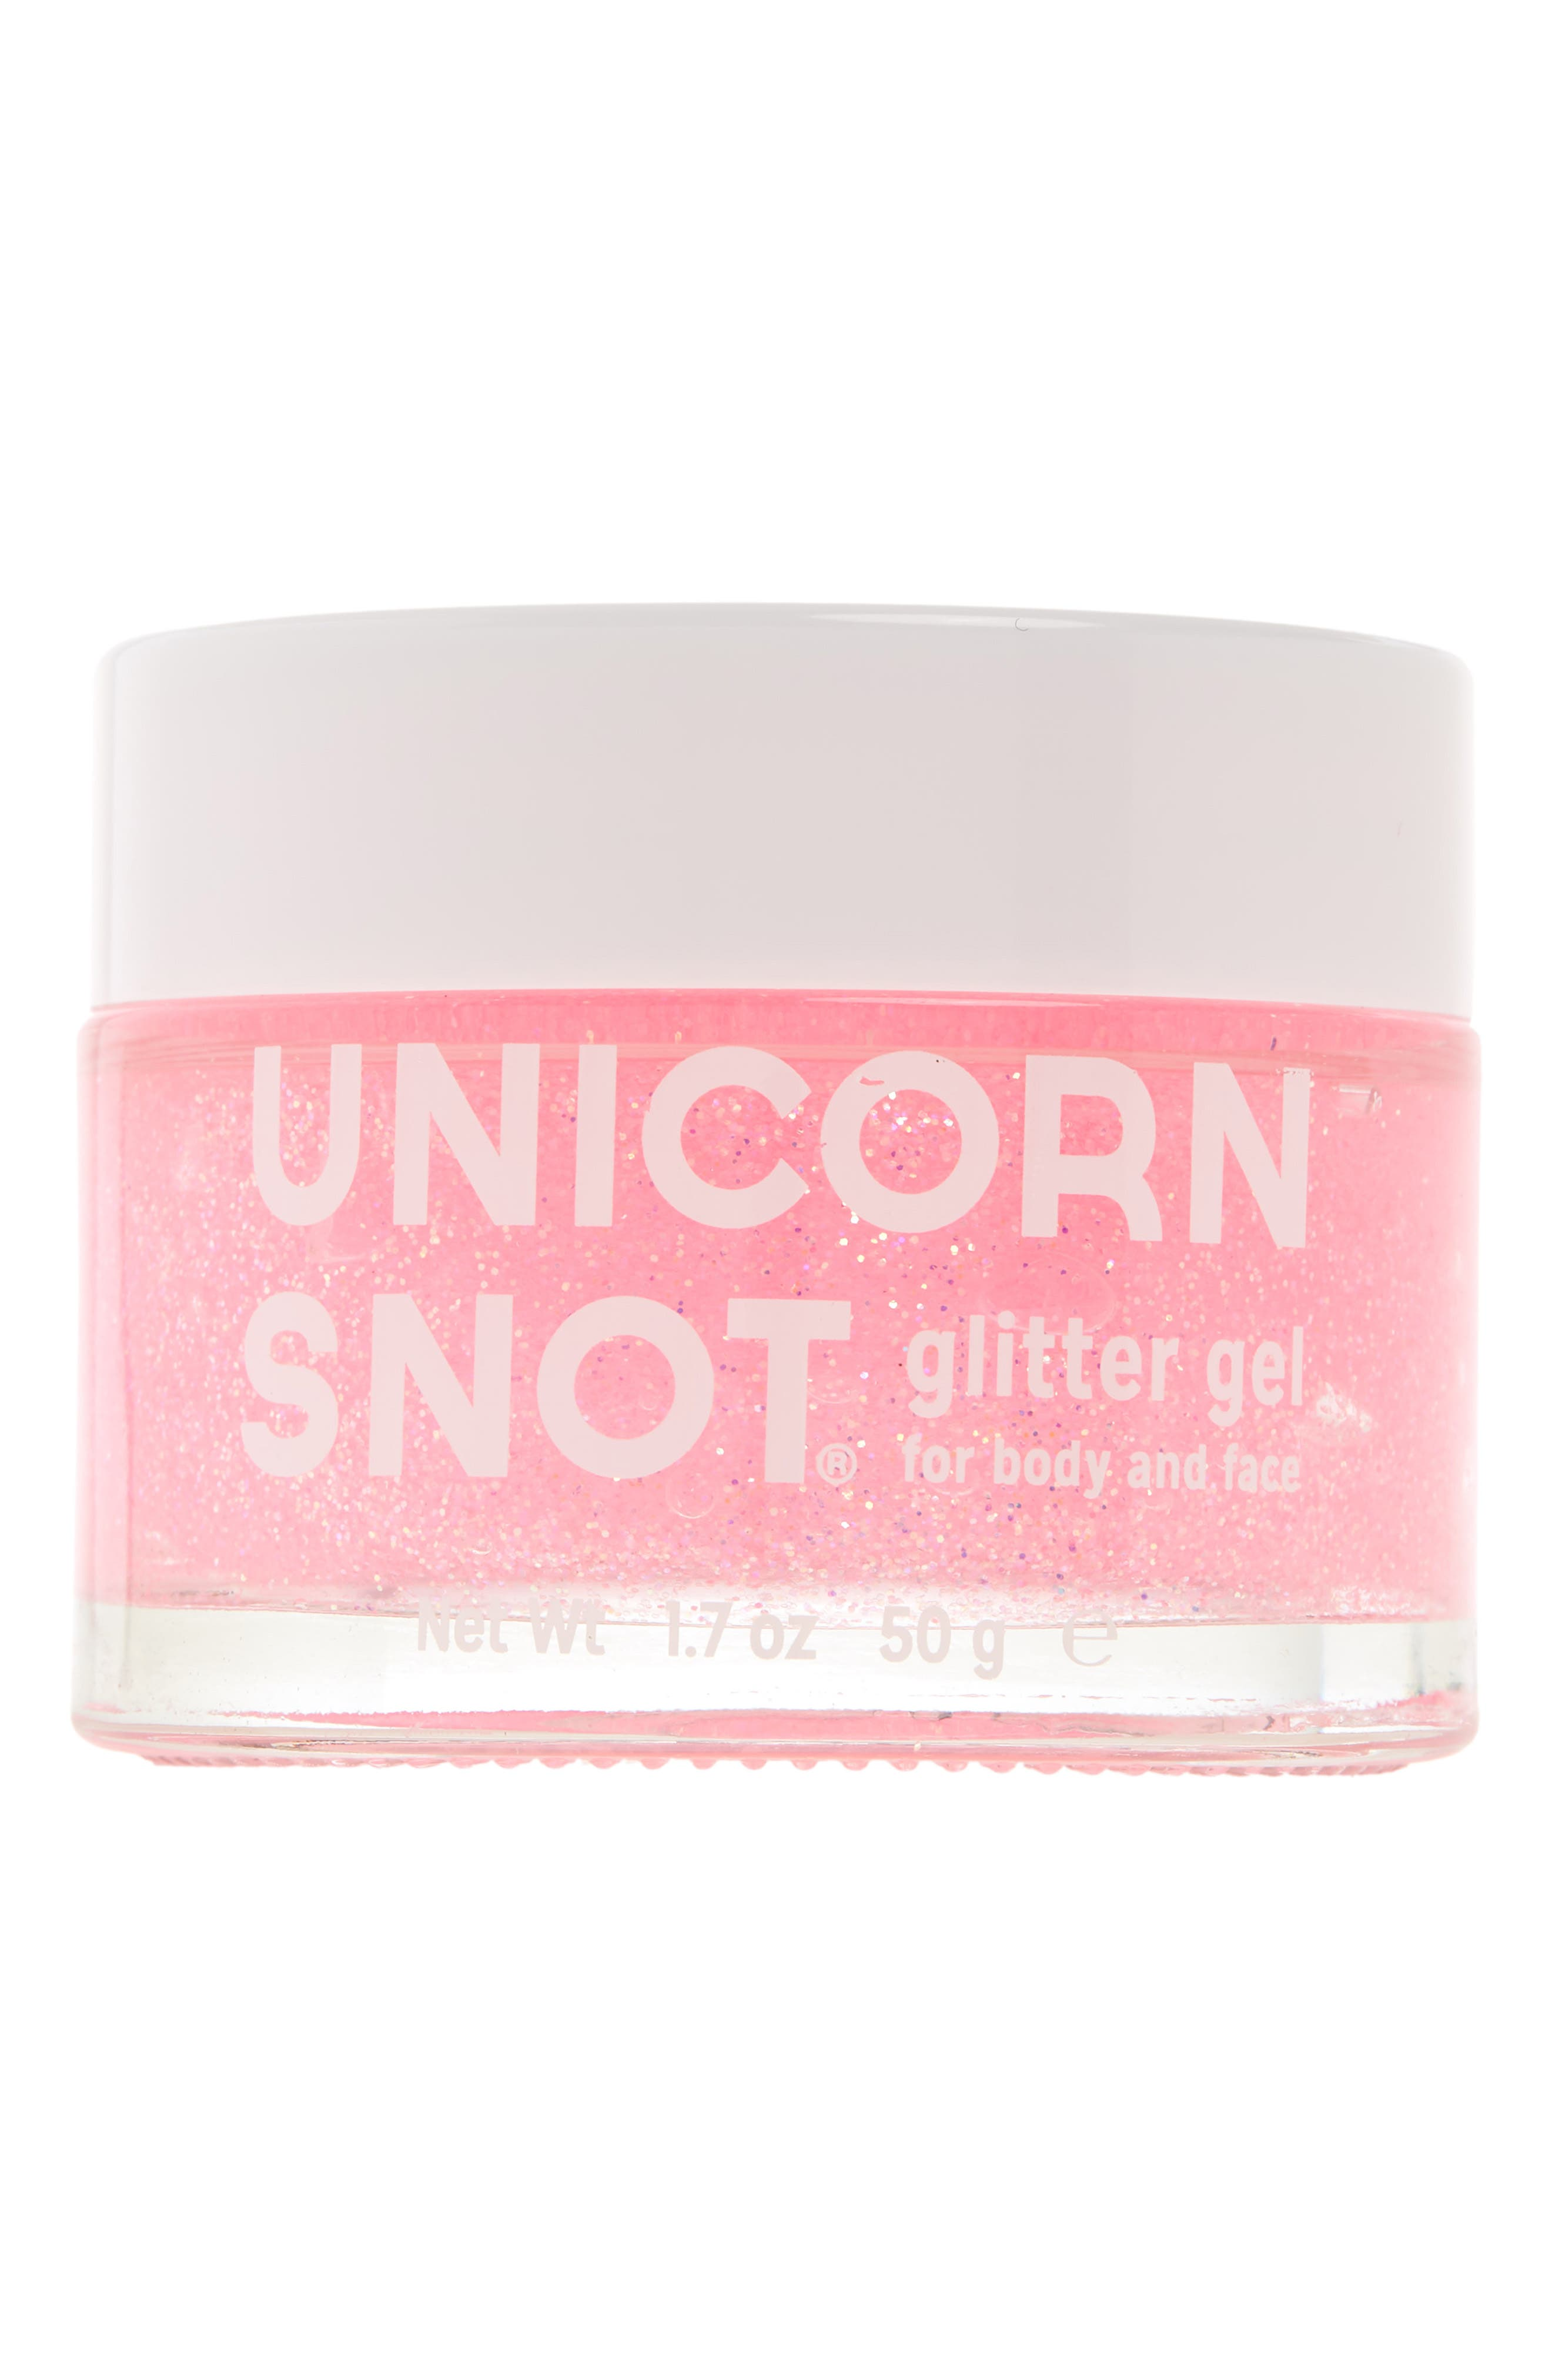 Unicorn Snot Glitter Gel,                             Main thumbnail 1, color,                             650